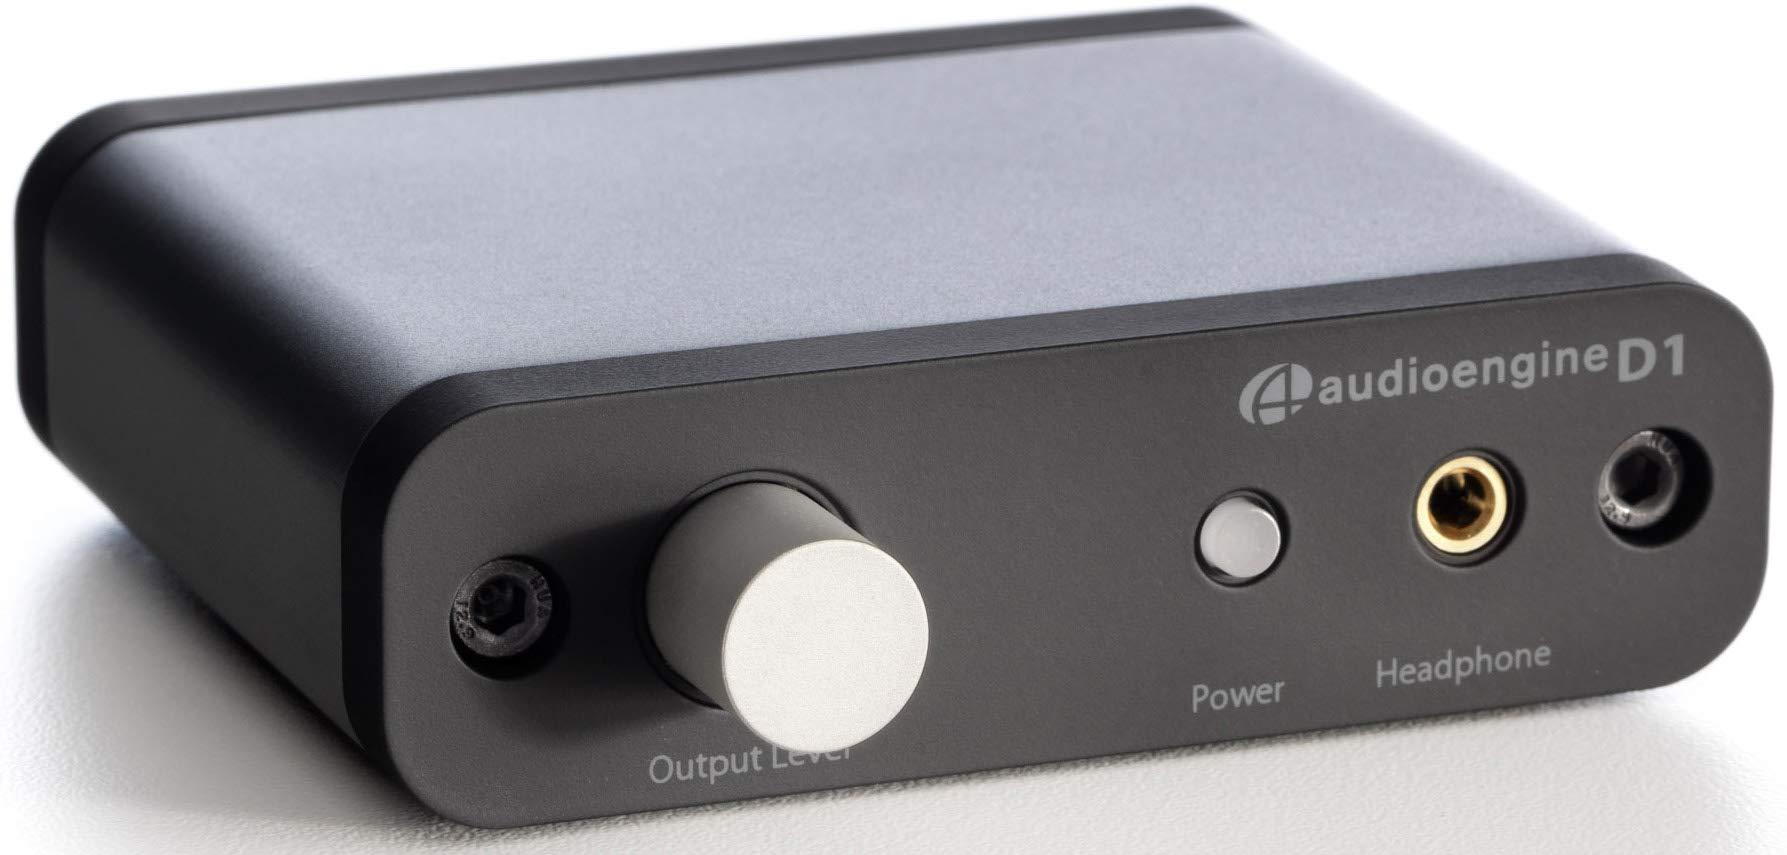 Audioengine D1 24-Bit DAC, Premium Desktop Digital To Analogue Converter and Headphone Amplifier product image